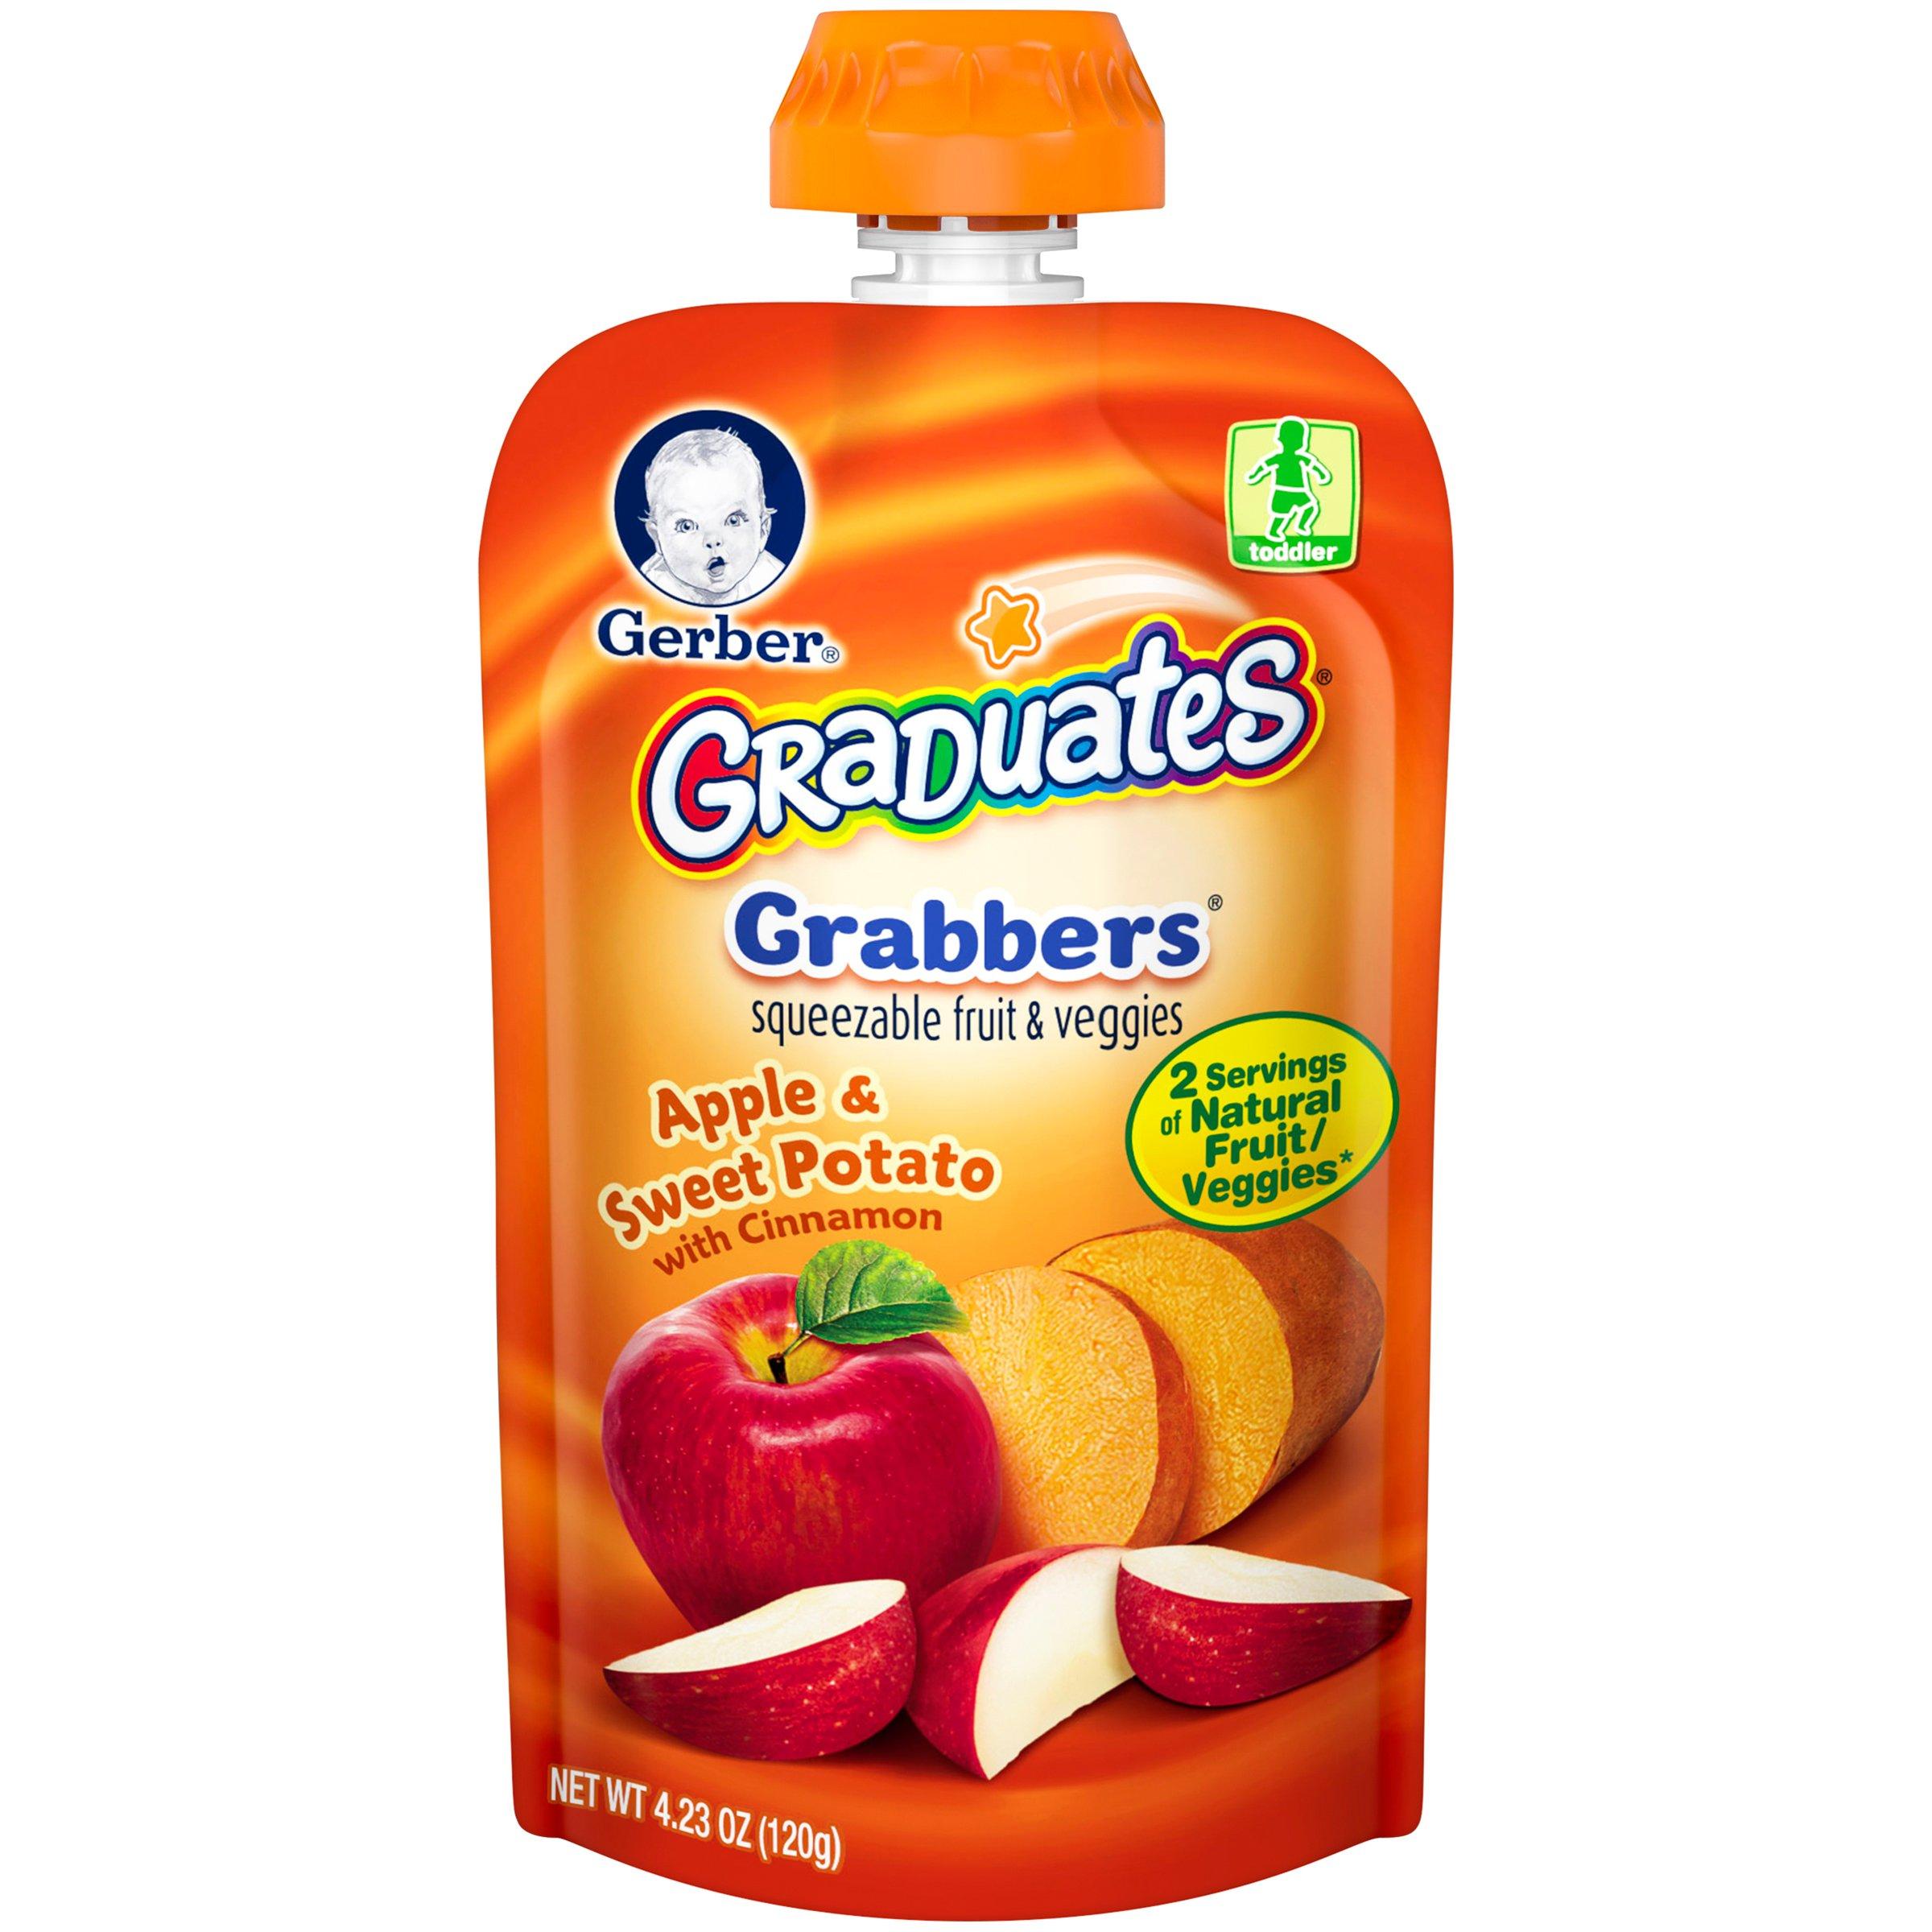 Gerber Graduates Grabbers Pouch, Apple Sweet Potato, 4.23 oz